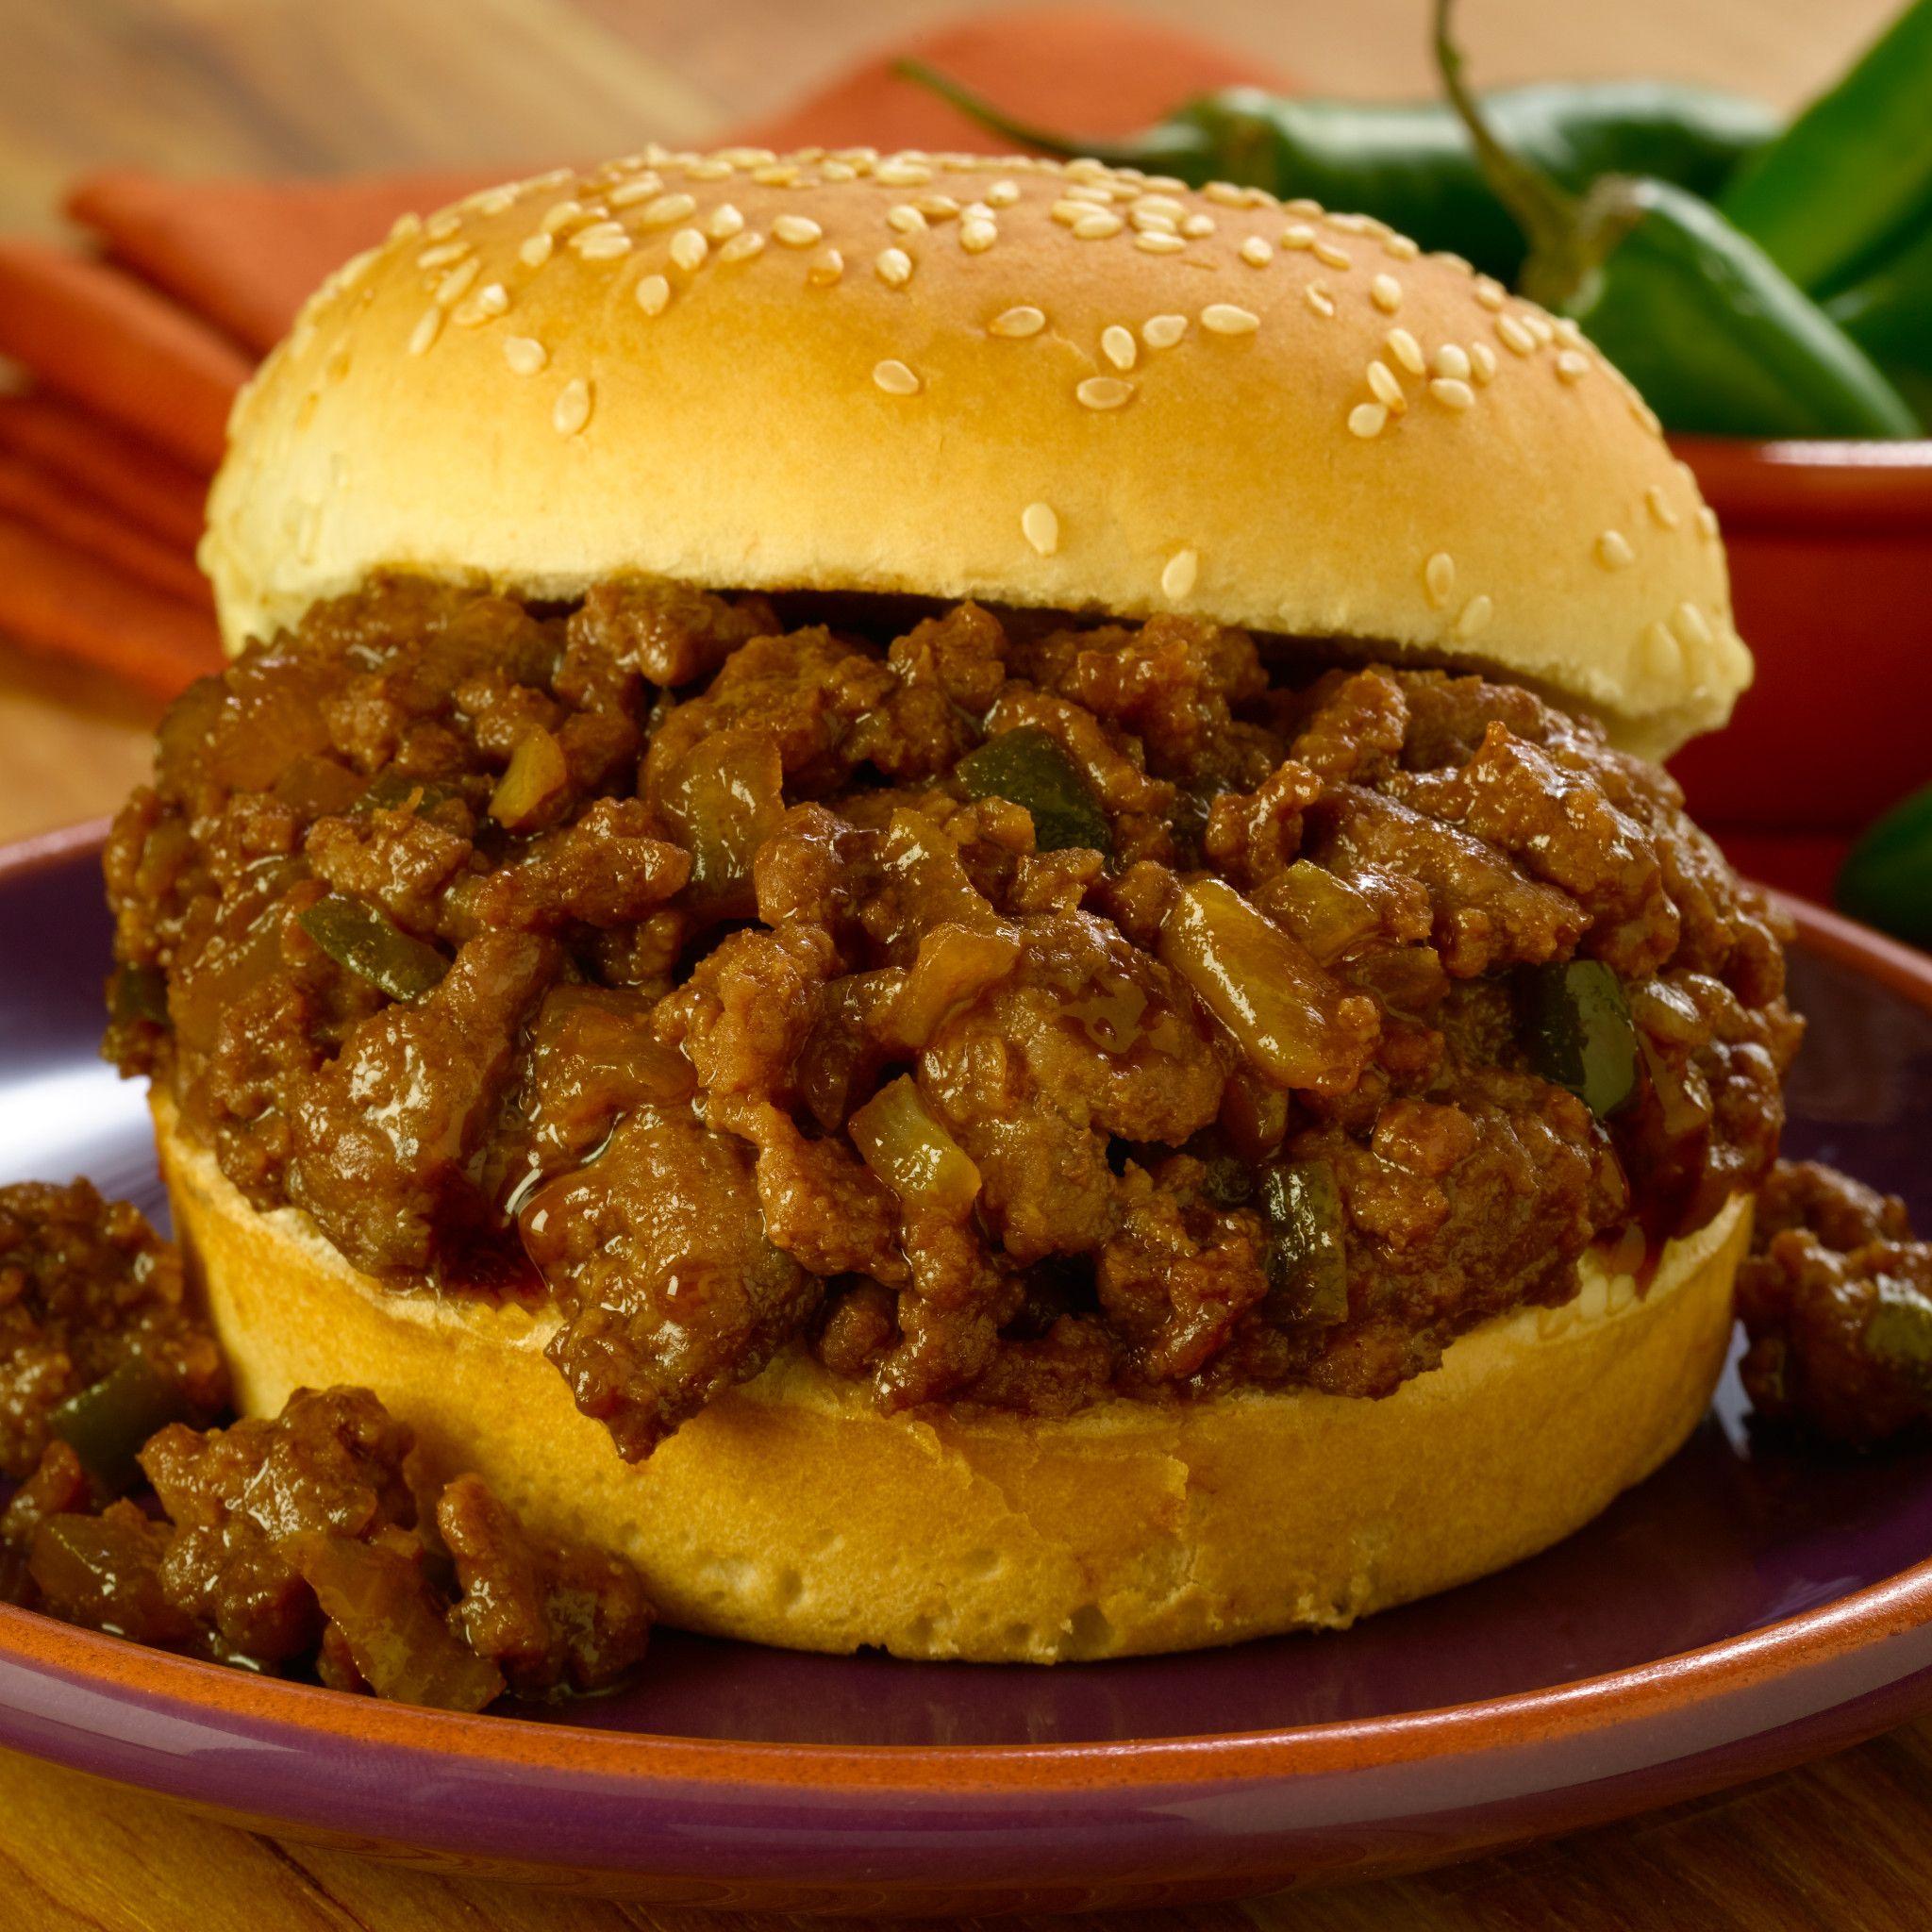 recipe: how many calories in a sloppy joe with bun [25]